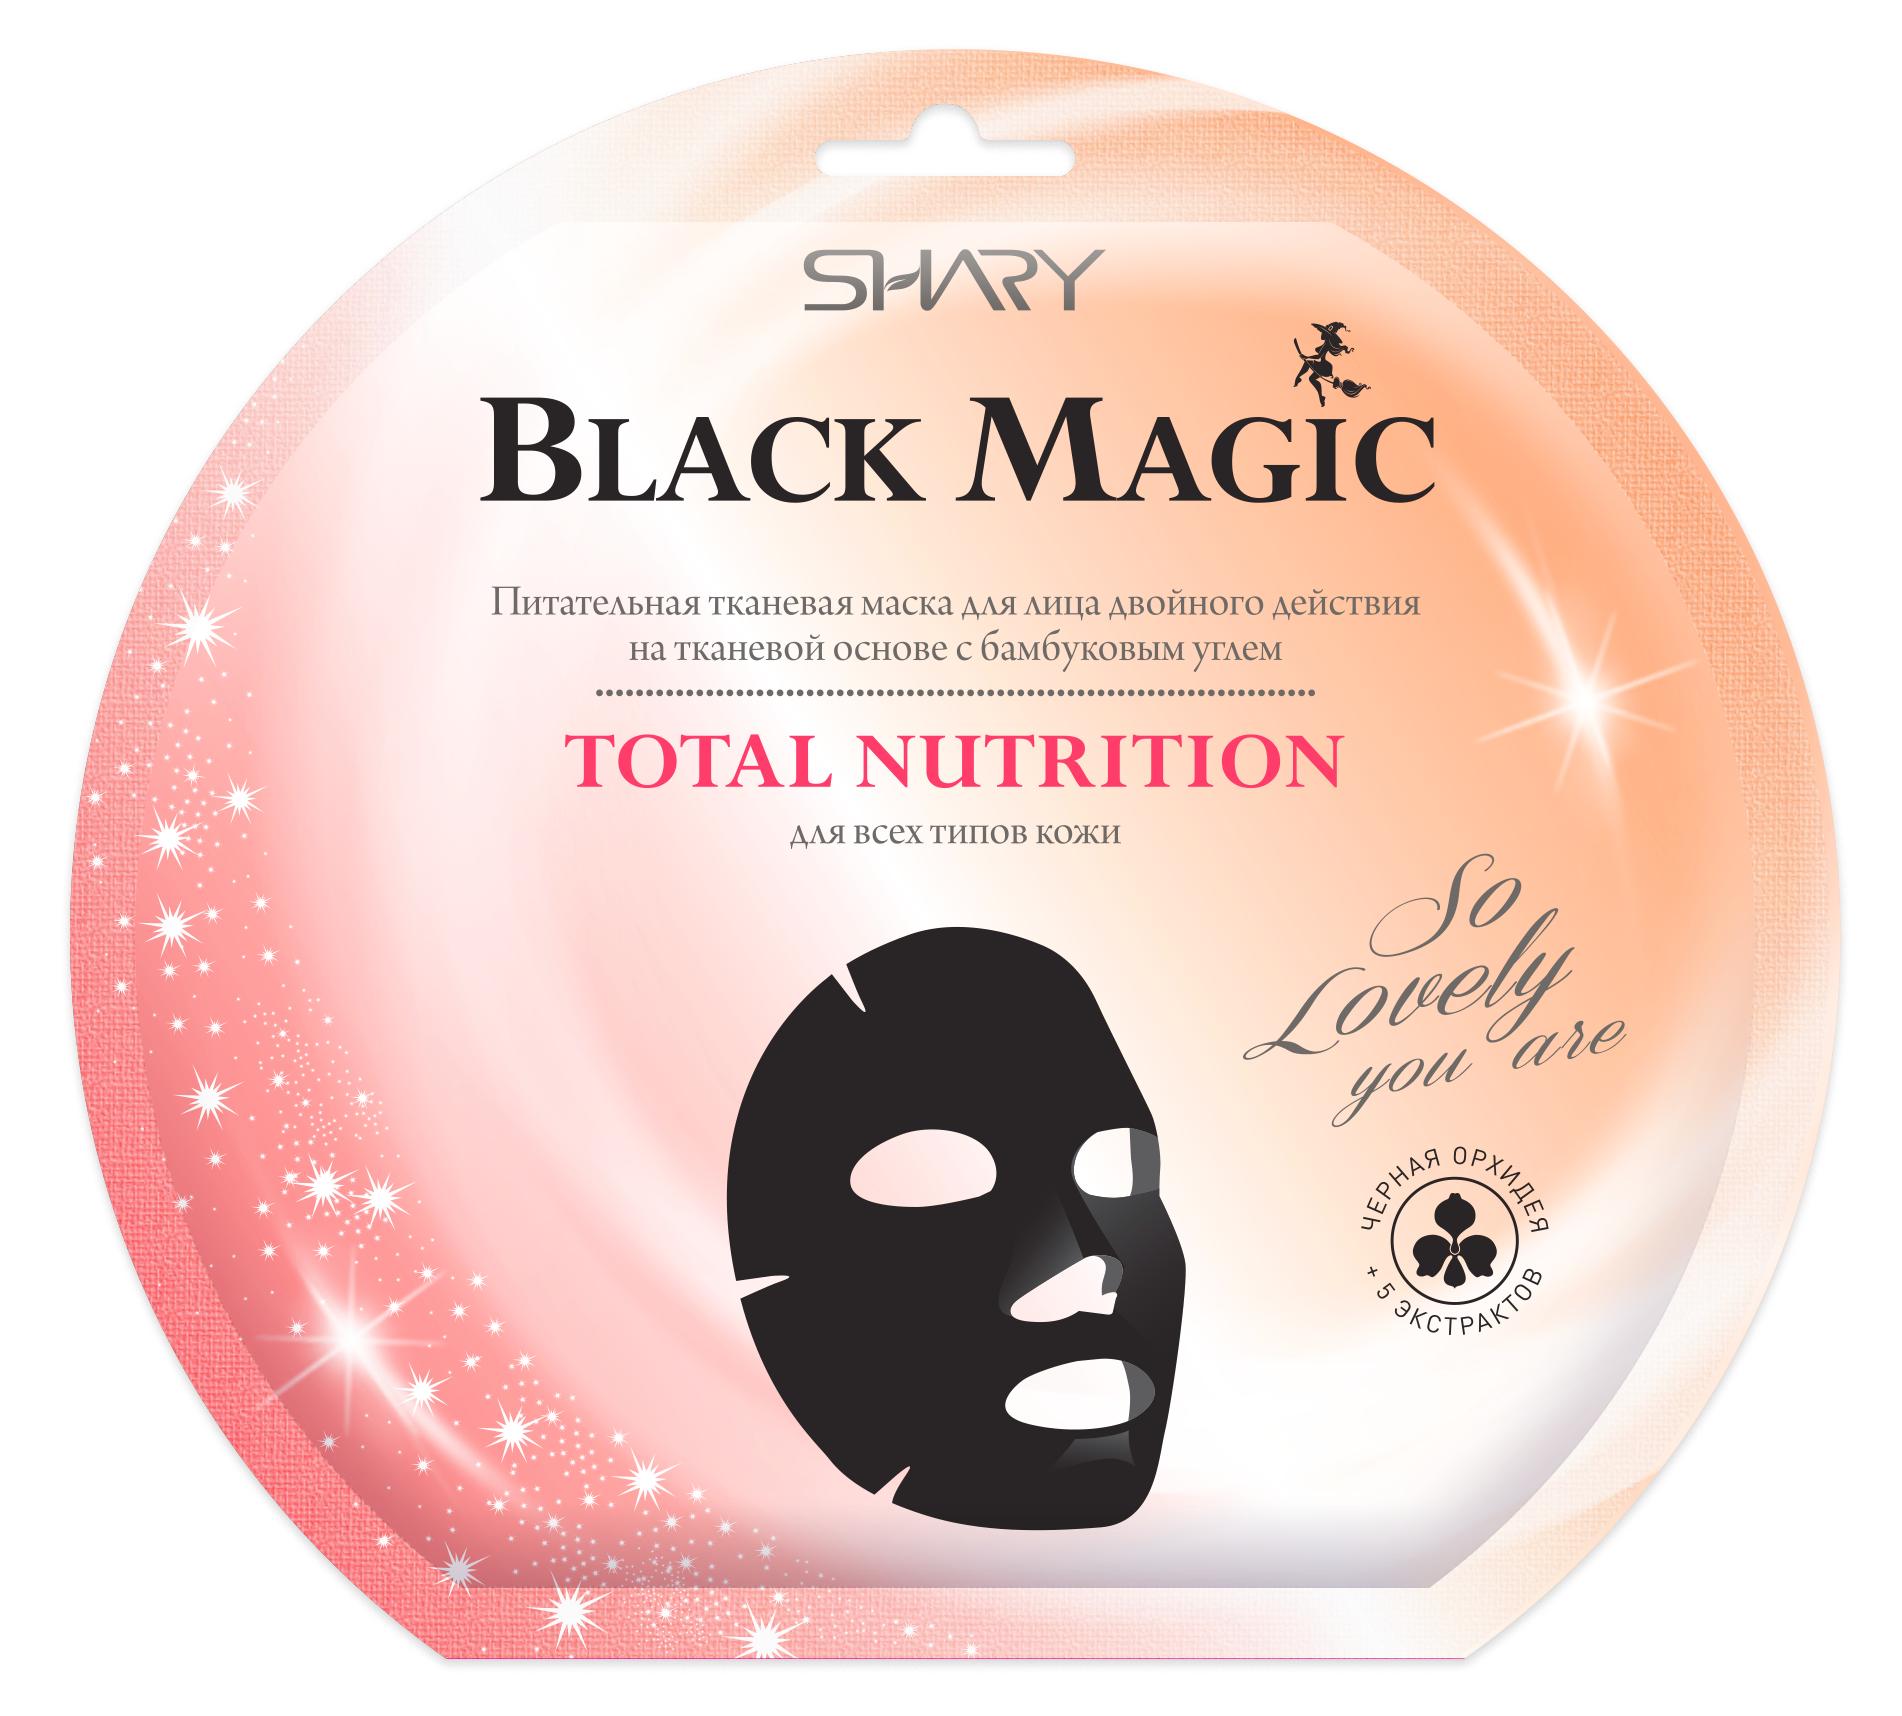 SHARY Маска питательная для лица / Shary Black magic TOTAL NUTRITION, 20 г